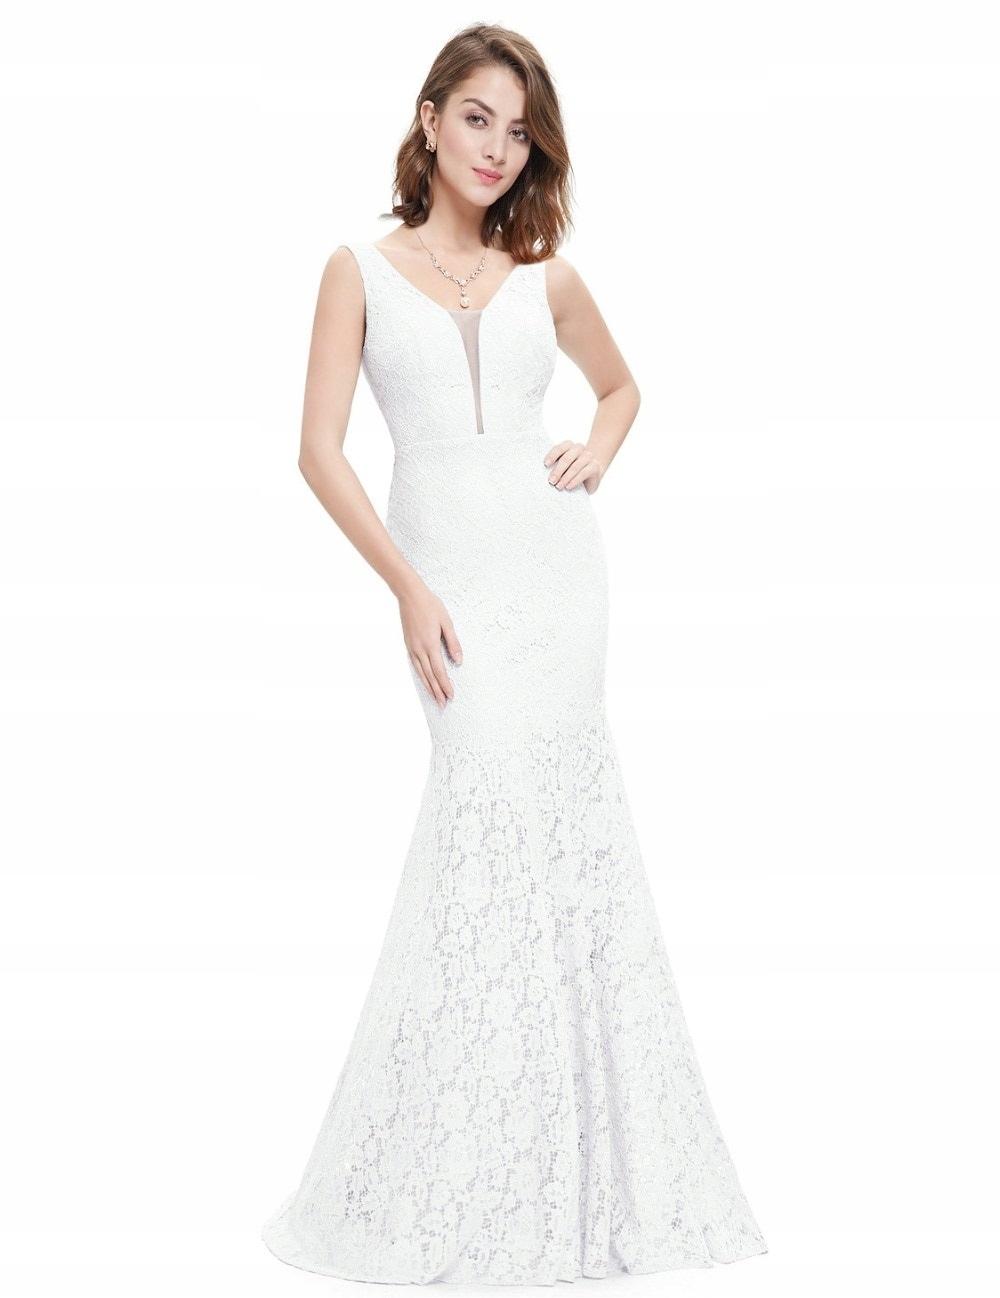 Suknia ślubna Typu Empire Długa Wesele Koronkowa S 7646527678